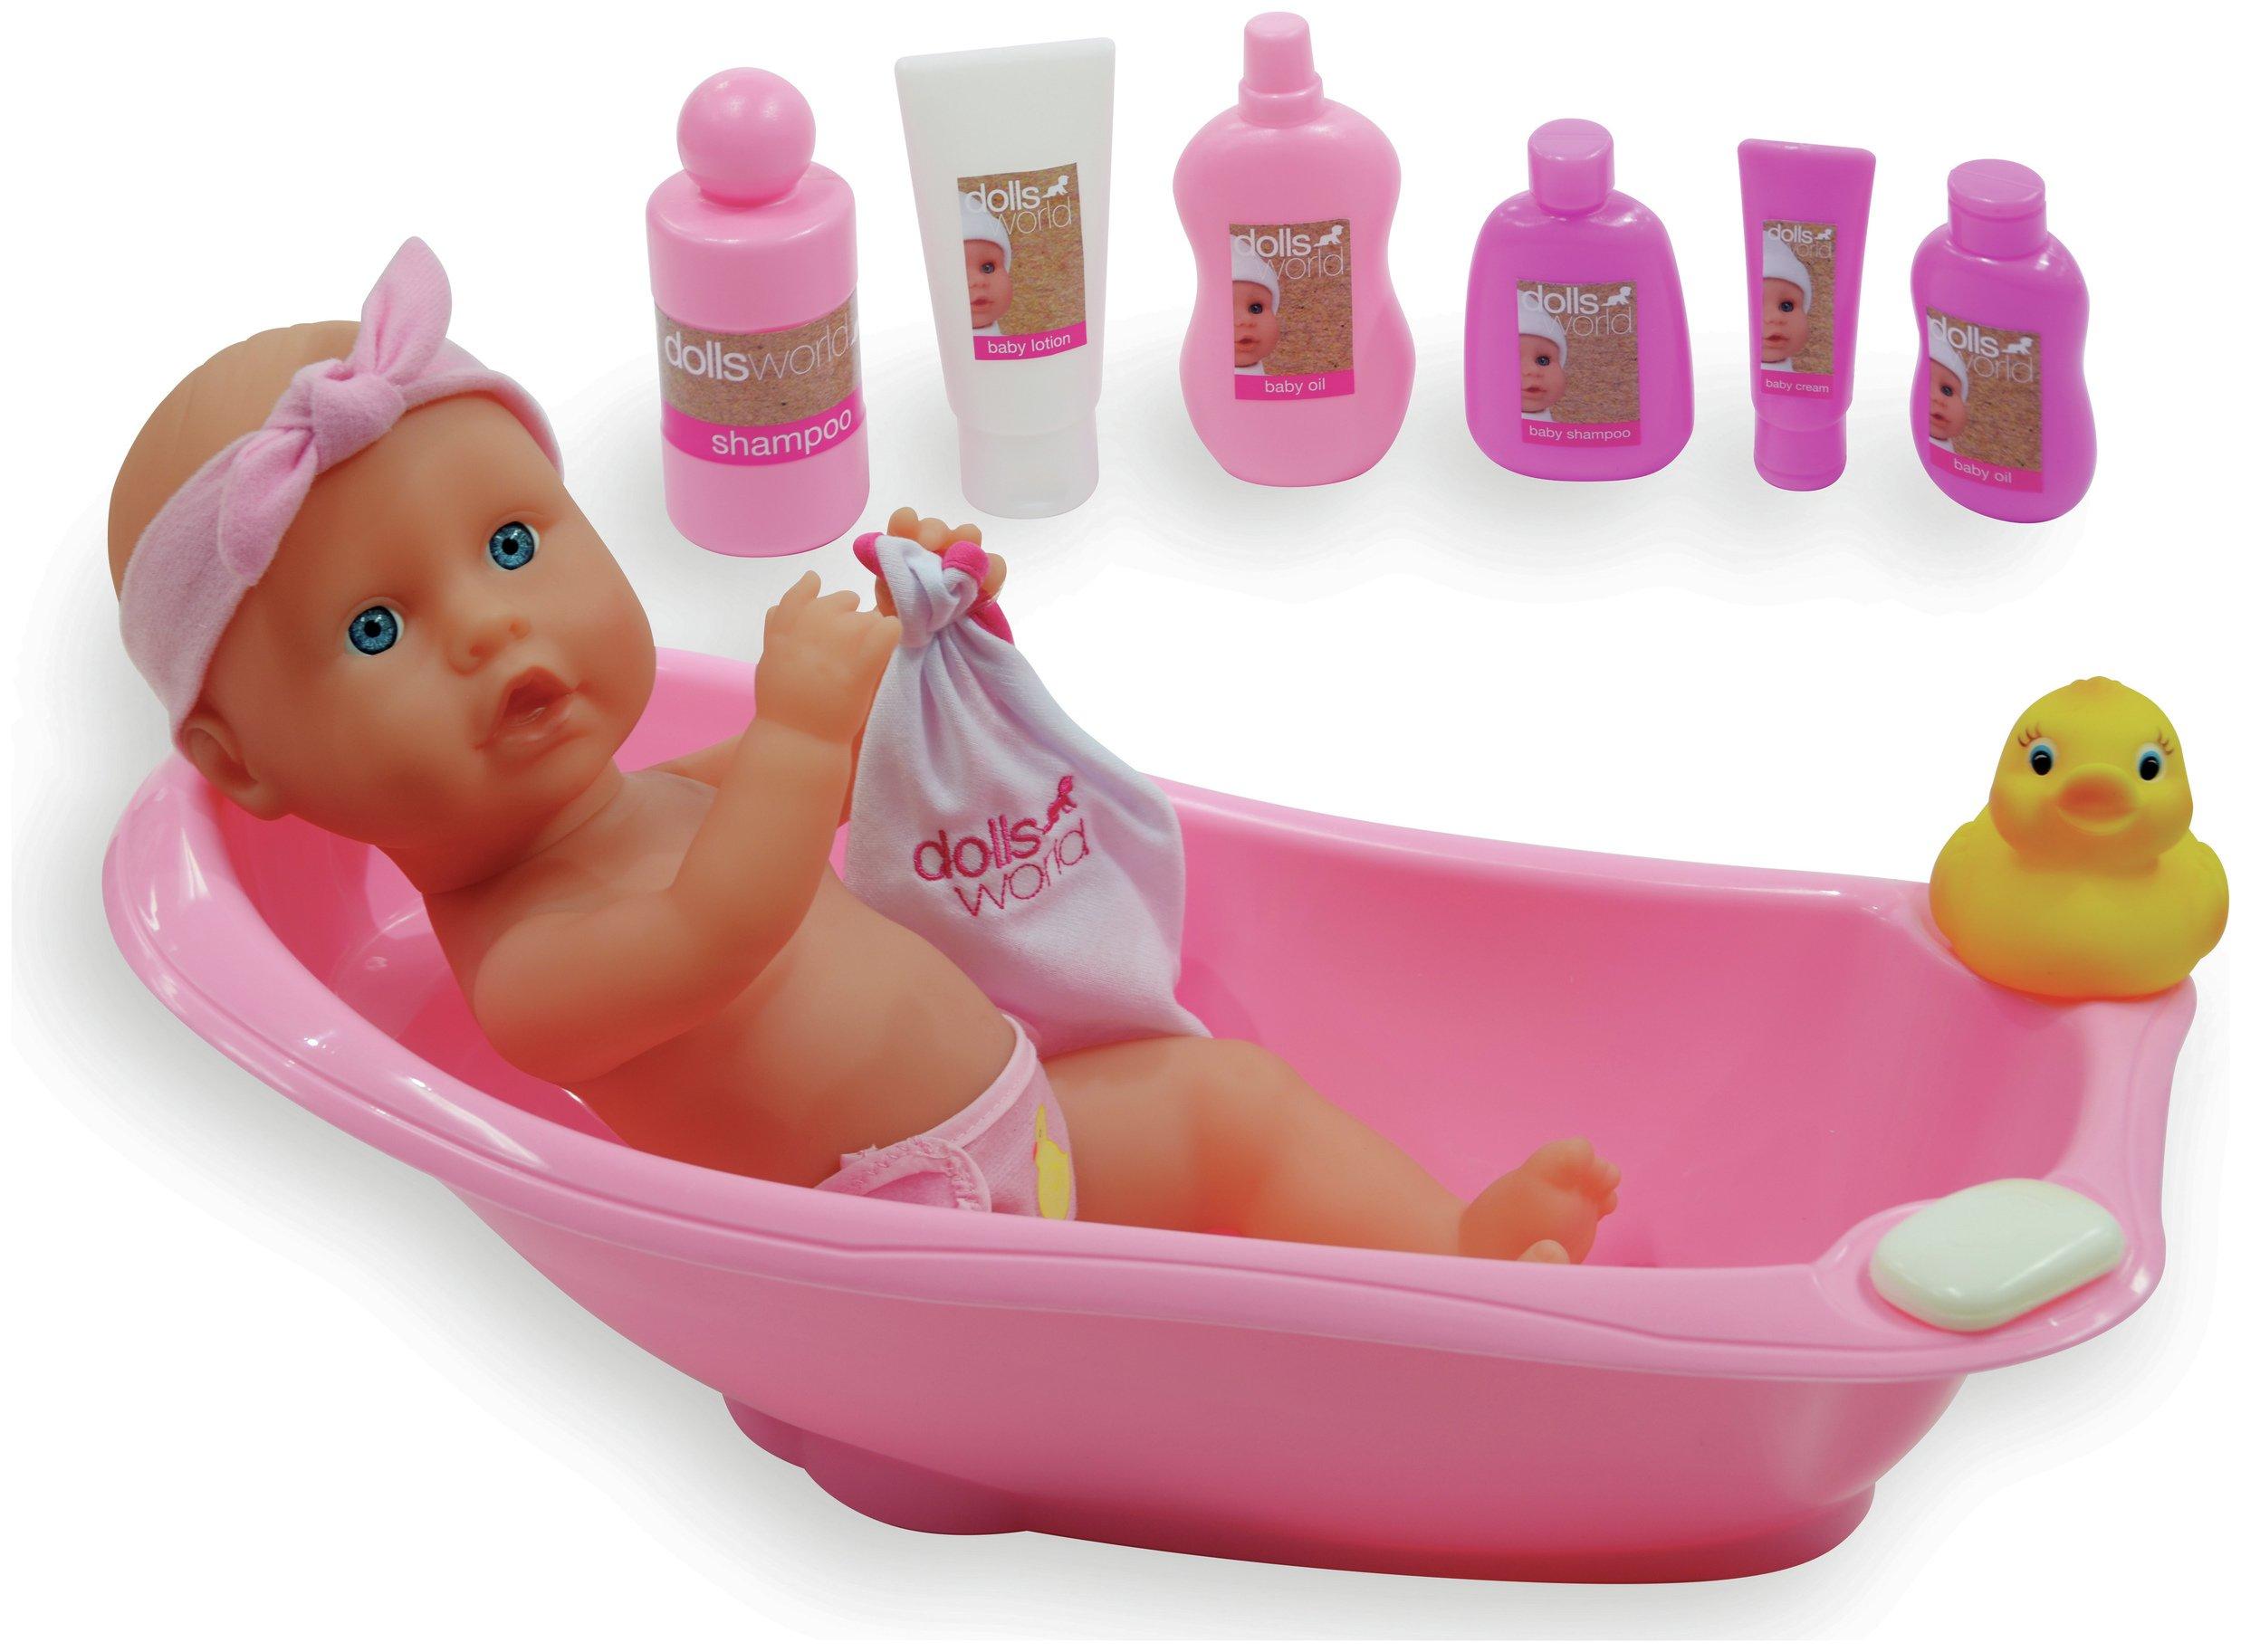 Image of Dollsworld Doll and Bath Playset.